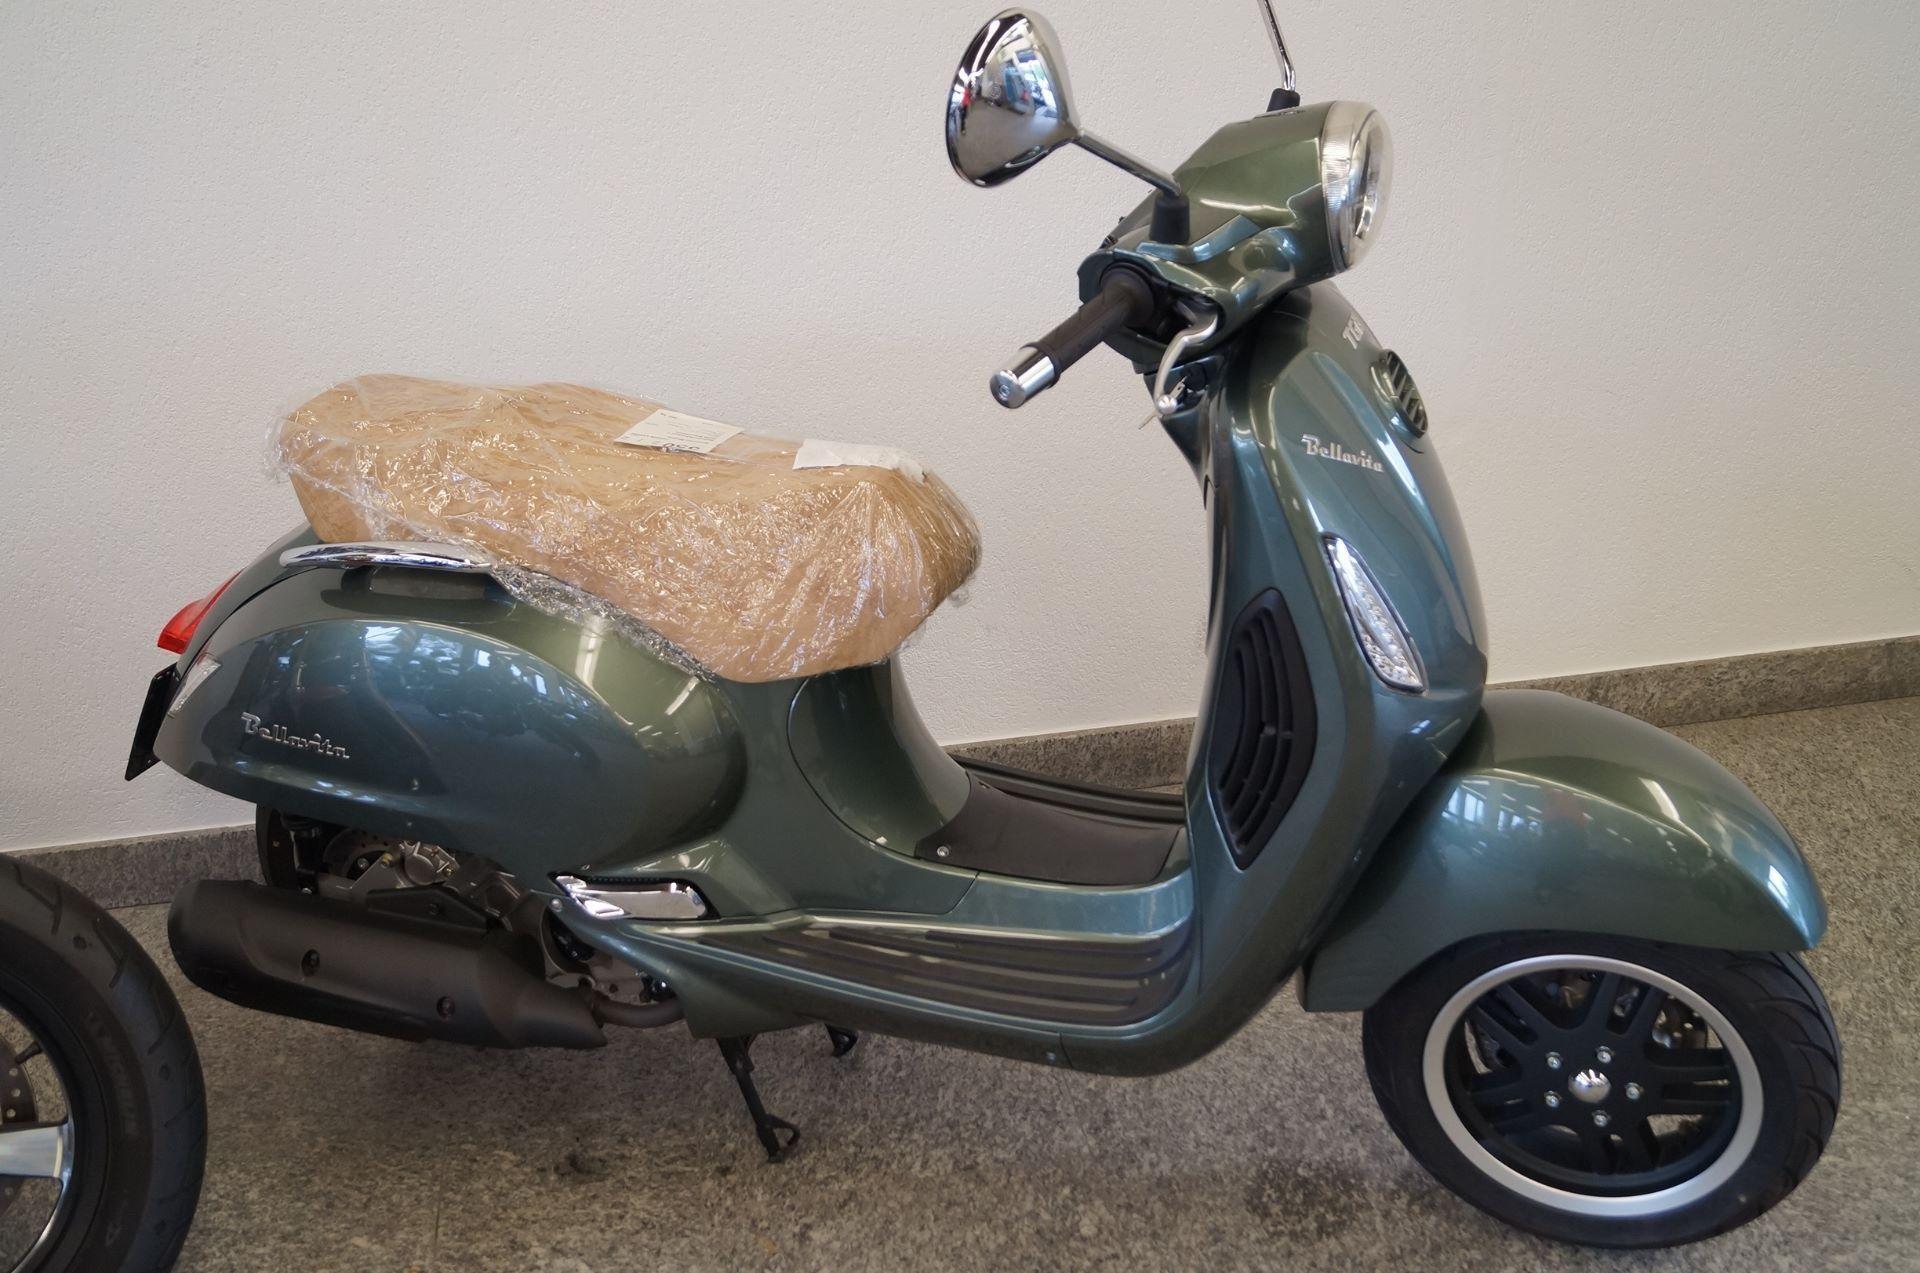 motorrad occasion kaufen tgb bellavita 125 scherrer motos. Black Bedroom Furniture Sets. Home Design Ideas